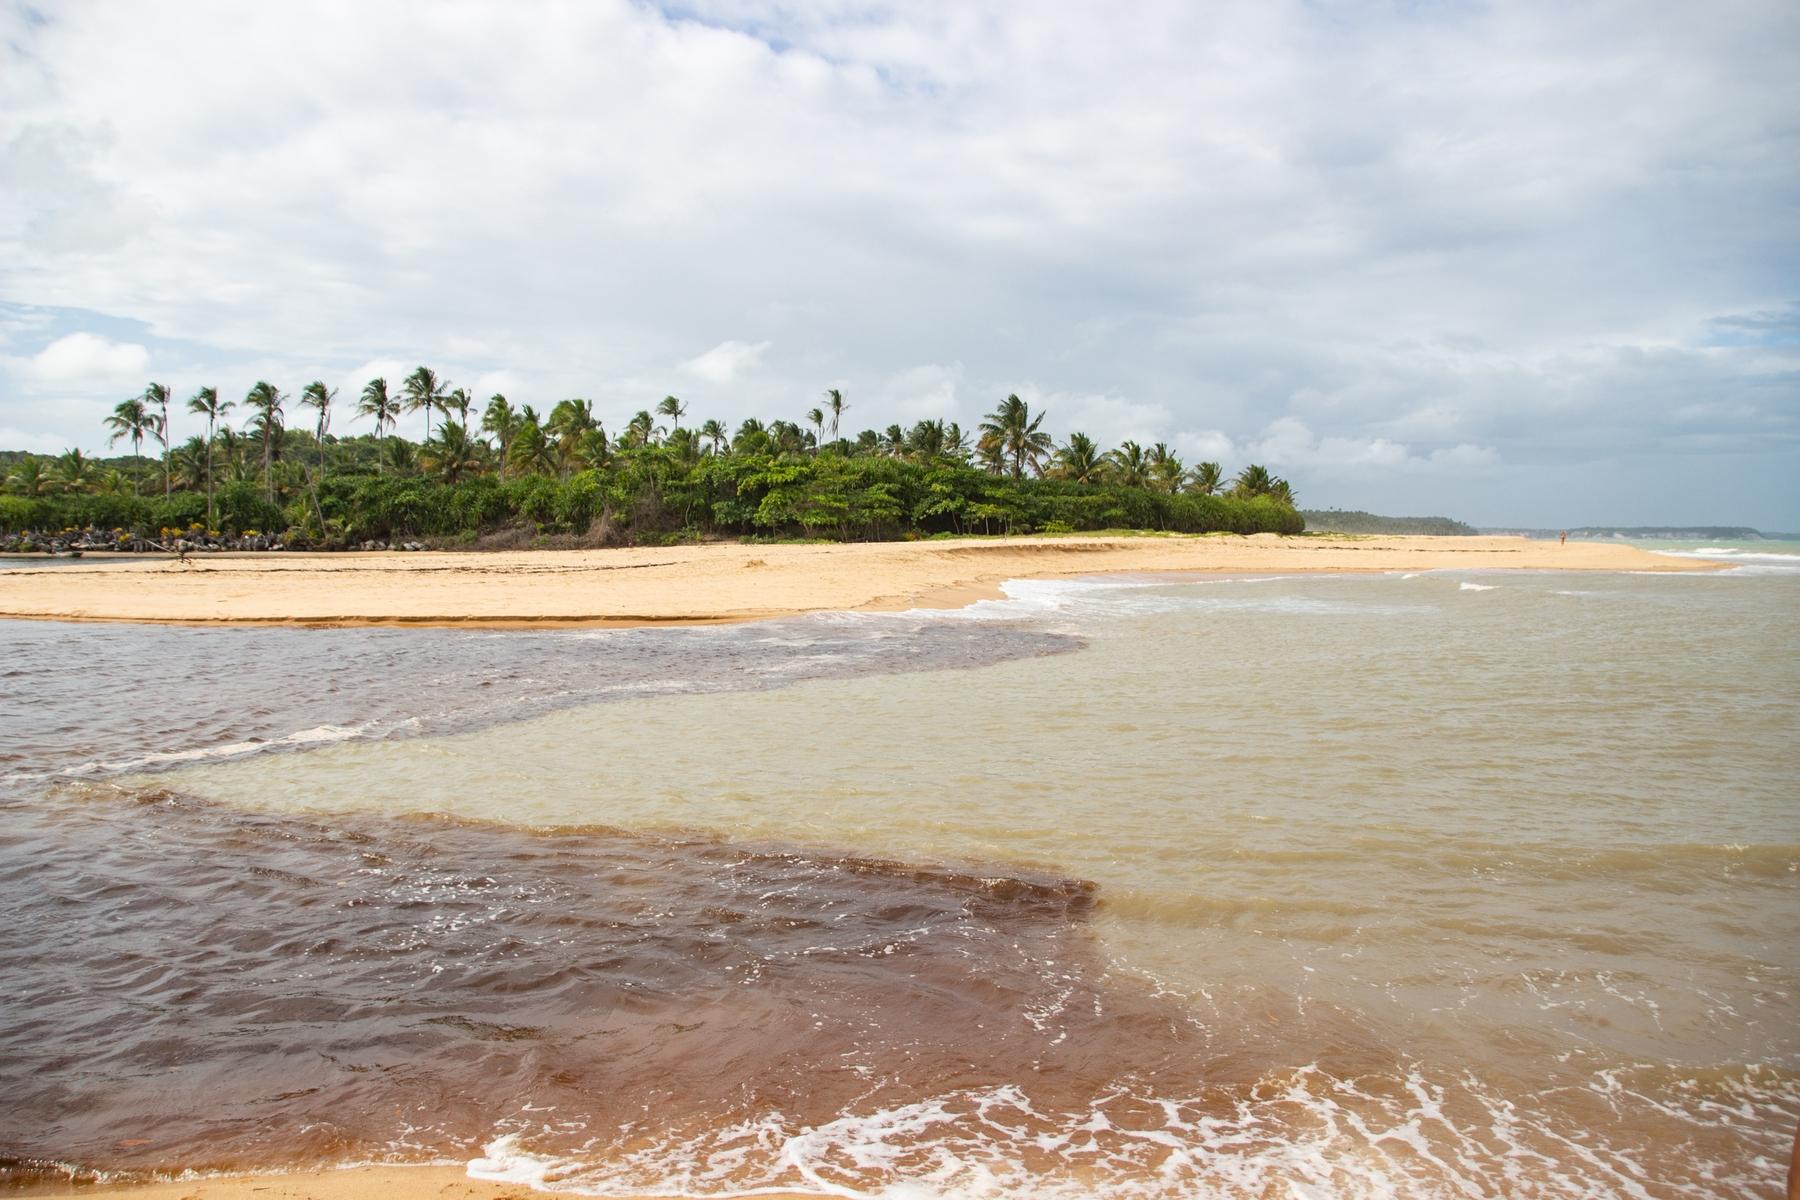 Encontro entre o Rio Caraíva e o mar - Lugar tranquilo para viajar no nordeste